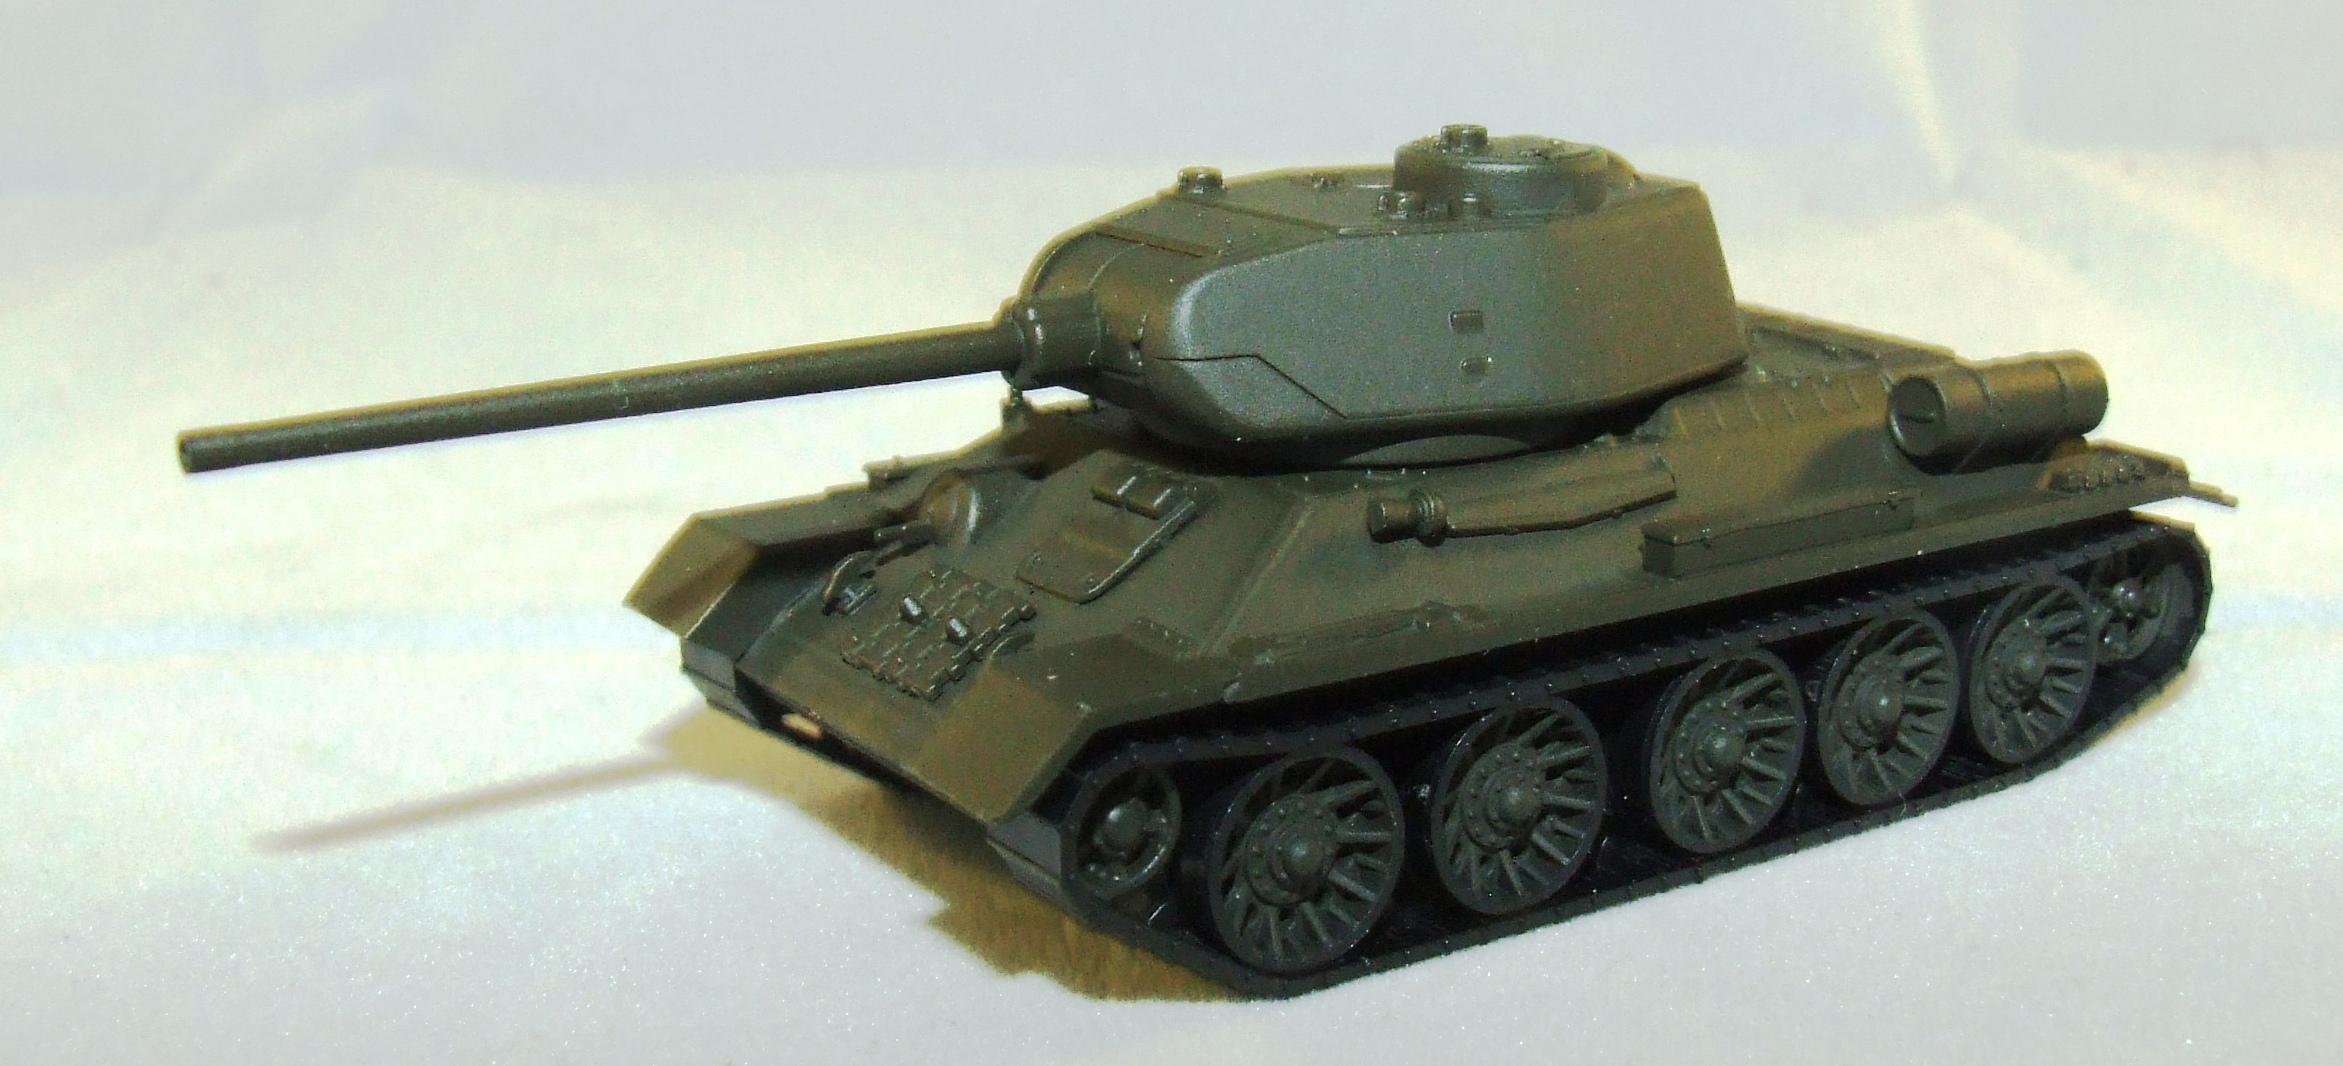 745574  Herpa Military Kampfpanzer T 34-85 SU NVA 1:87